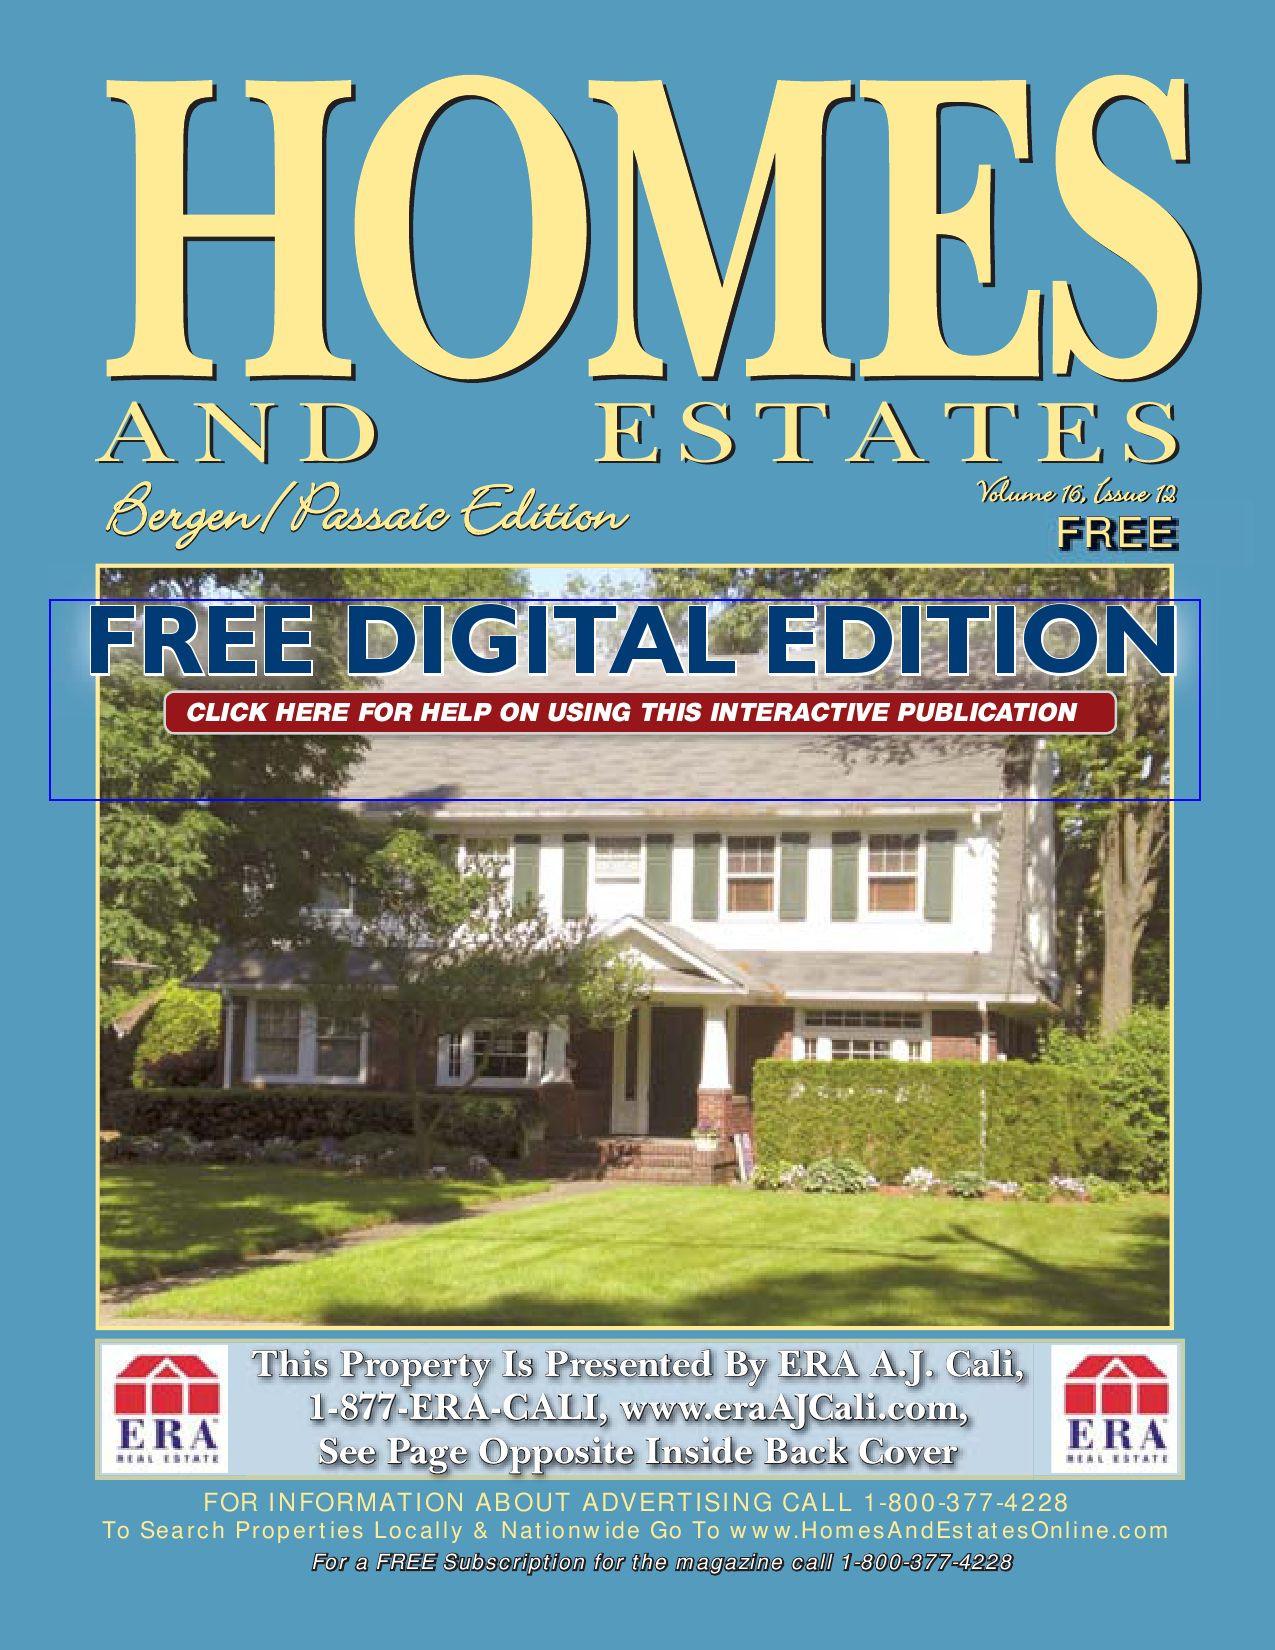 pc hardwood floors hillburn ny of homes and estates magazine bergen passaic nj by gene petraglia issuu intended for page 1